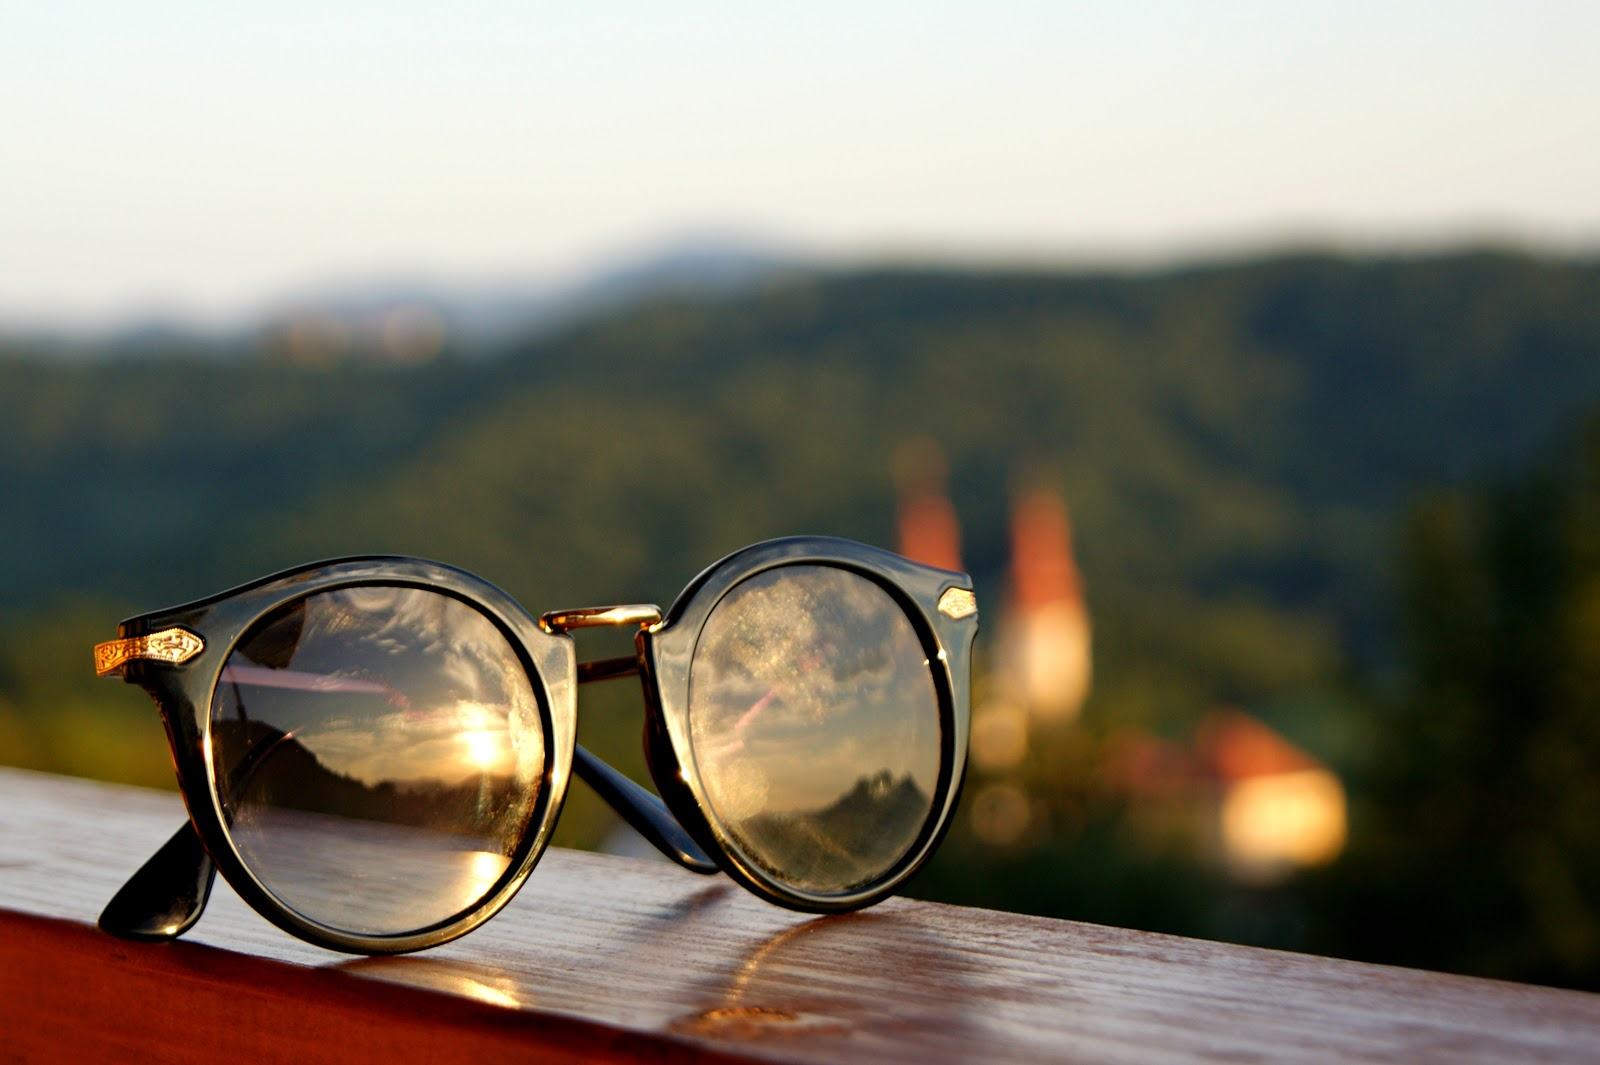 Keating Young: GlassesShop sent me Glasses!